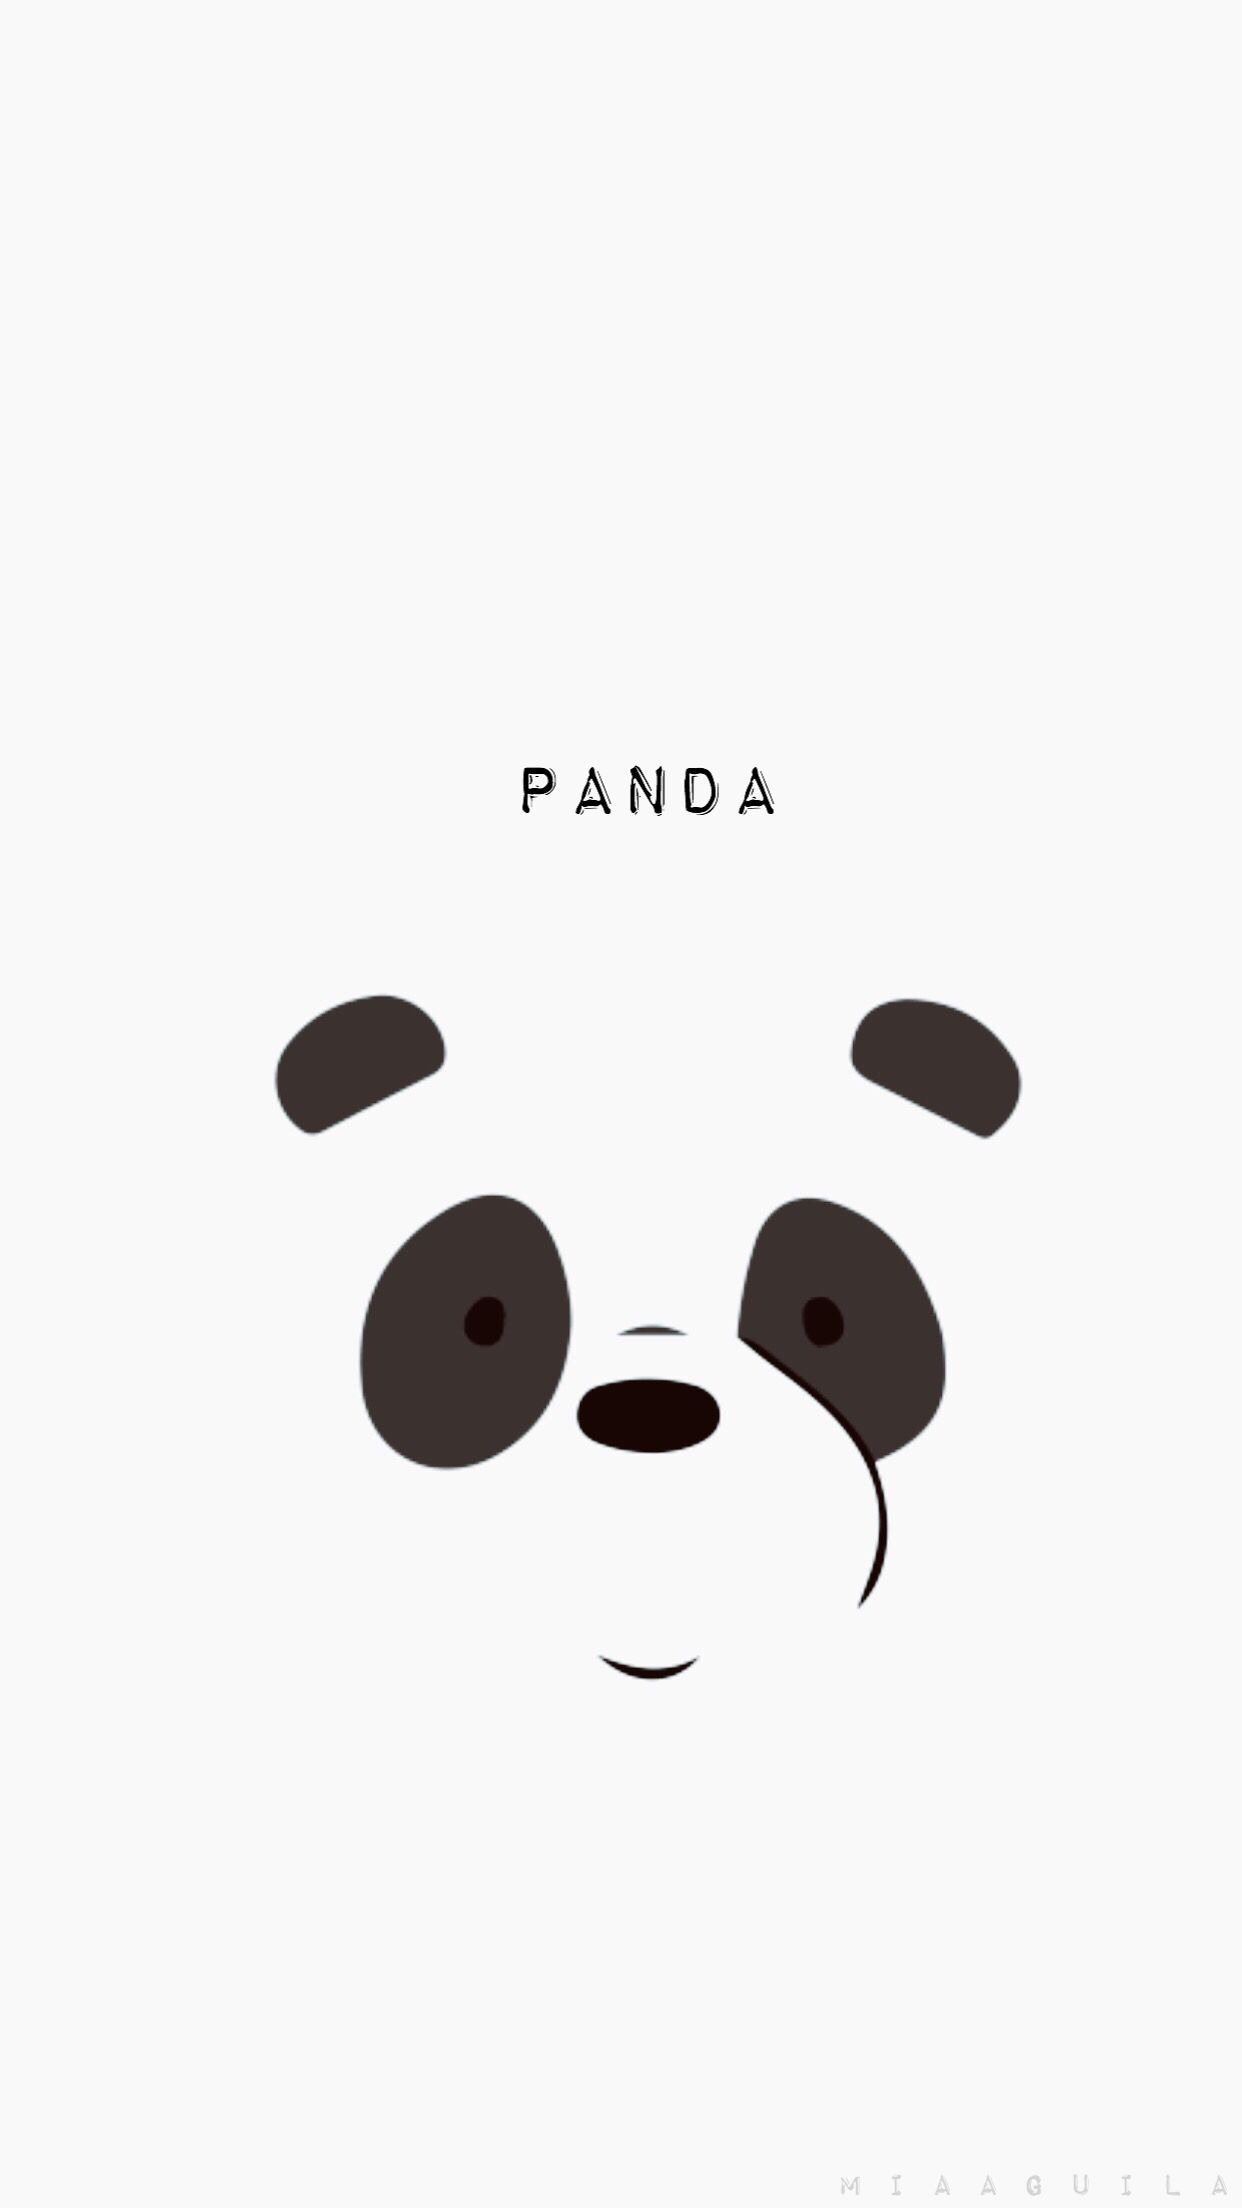 11/10/2021· foto profil wa couple lucu. Aesthetic Panda Wallpapers Wallpaper Cave